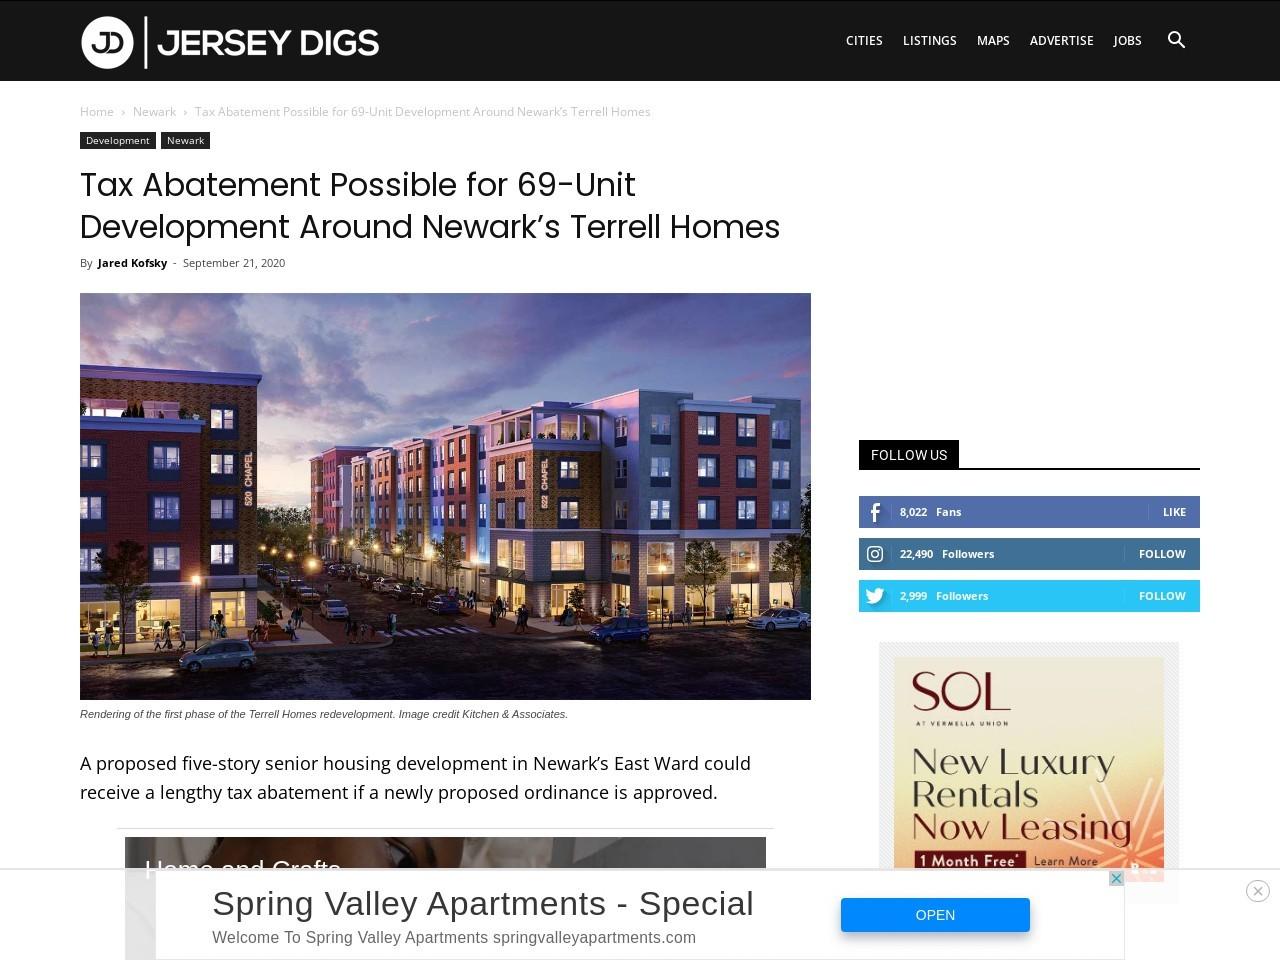 Tax Abatement Possible for 69-Unit Development Around Newark's Terrell Homes